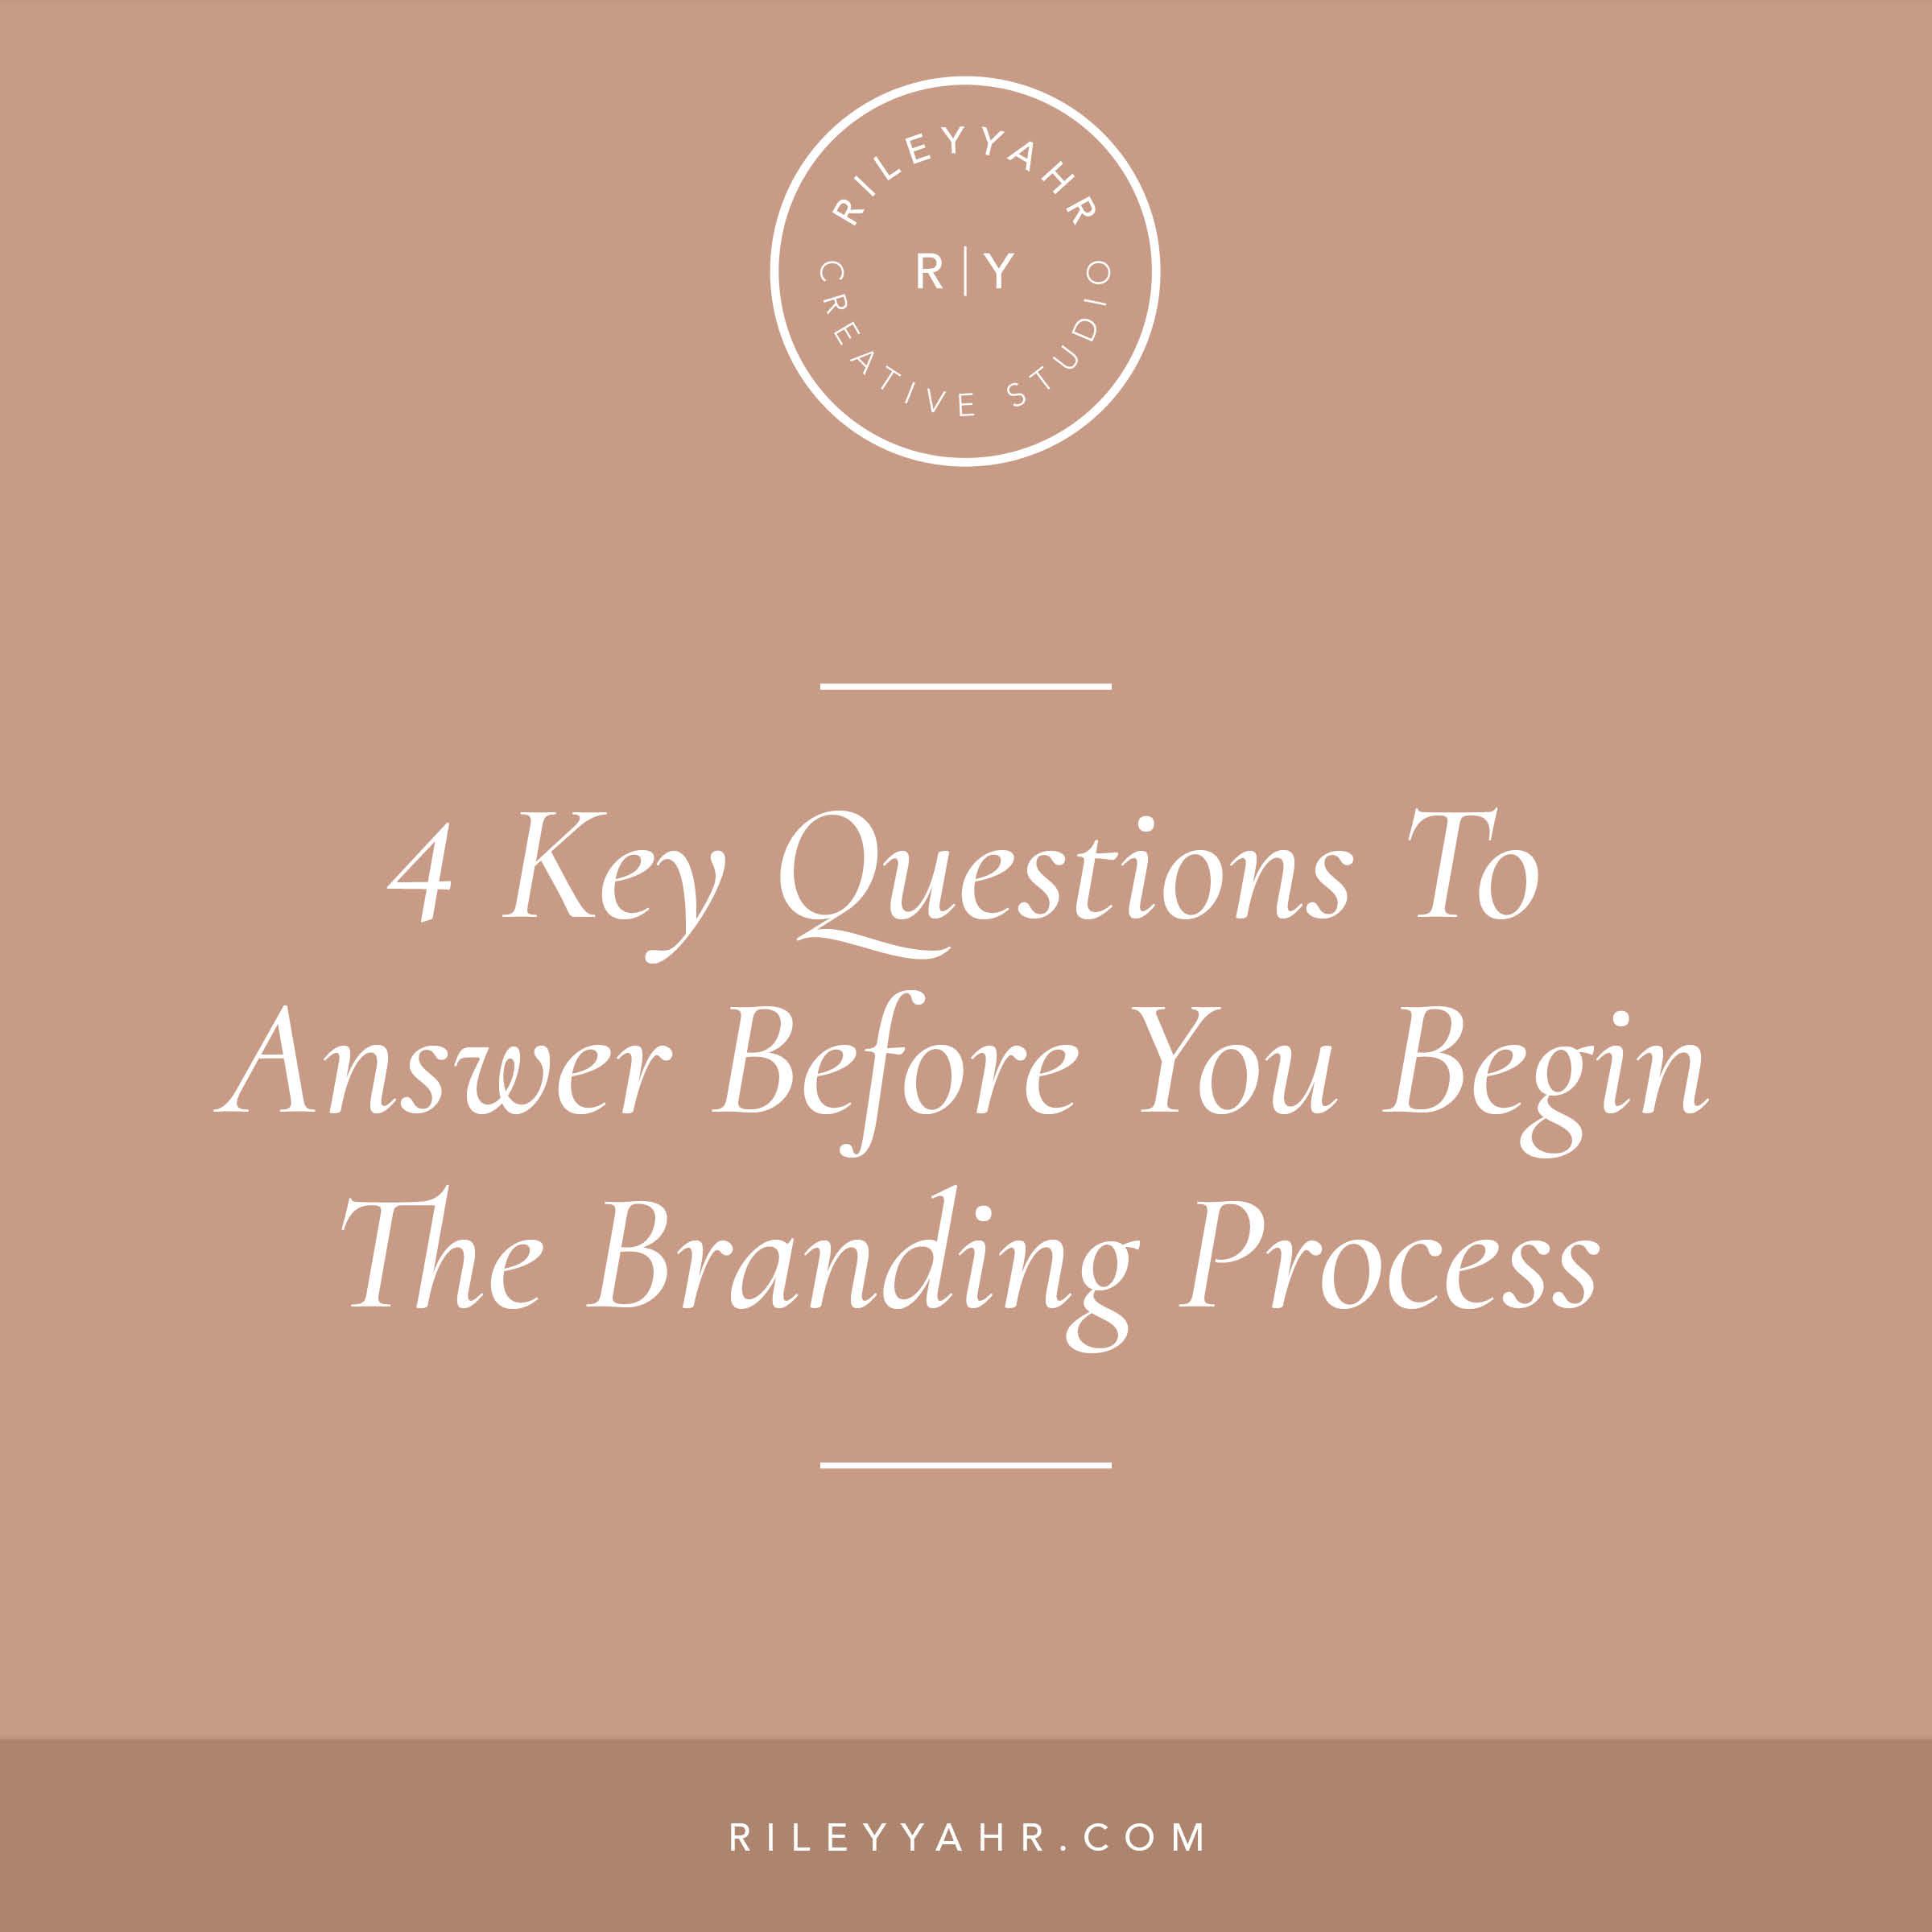 Riley Yahr Creative Studio - Branding Process